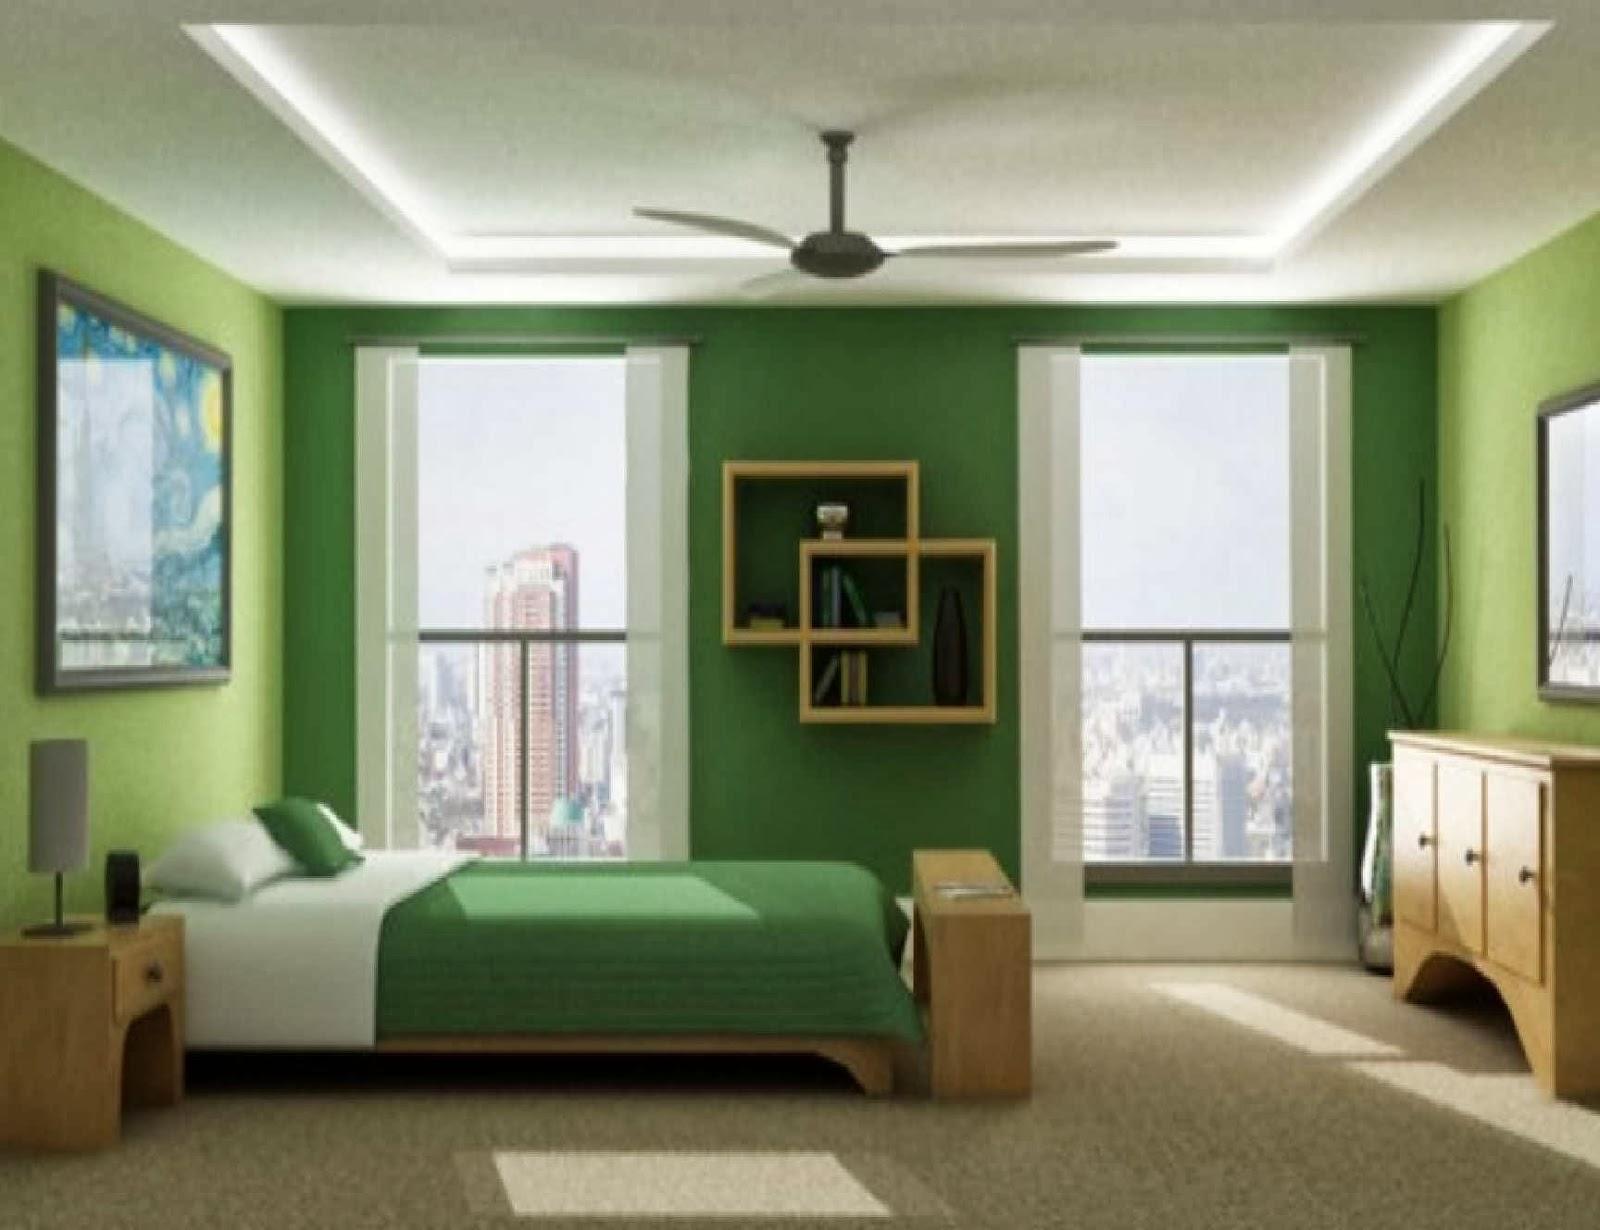 gambar kamar tidur minimalis modern terbaru 2017